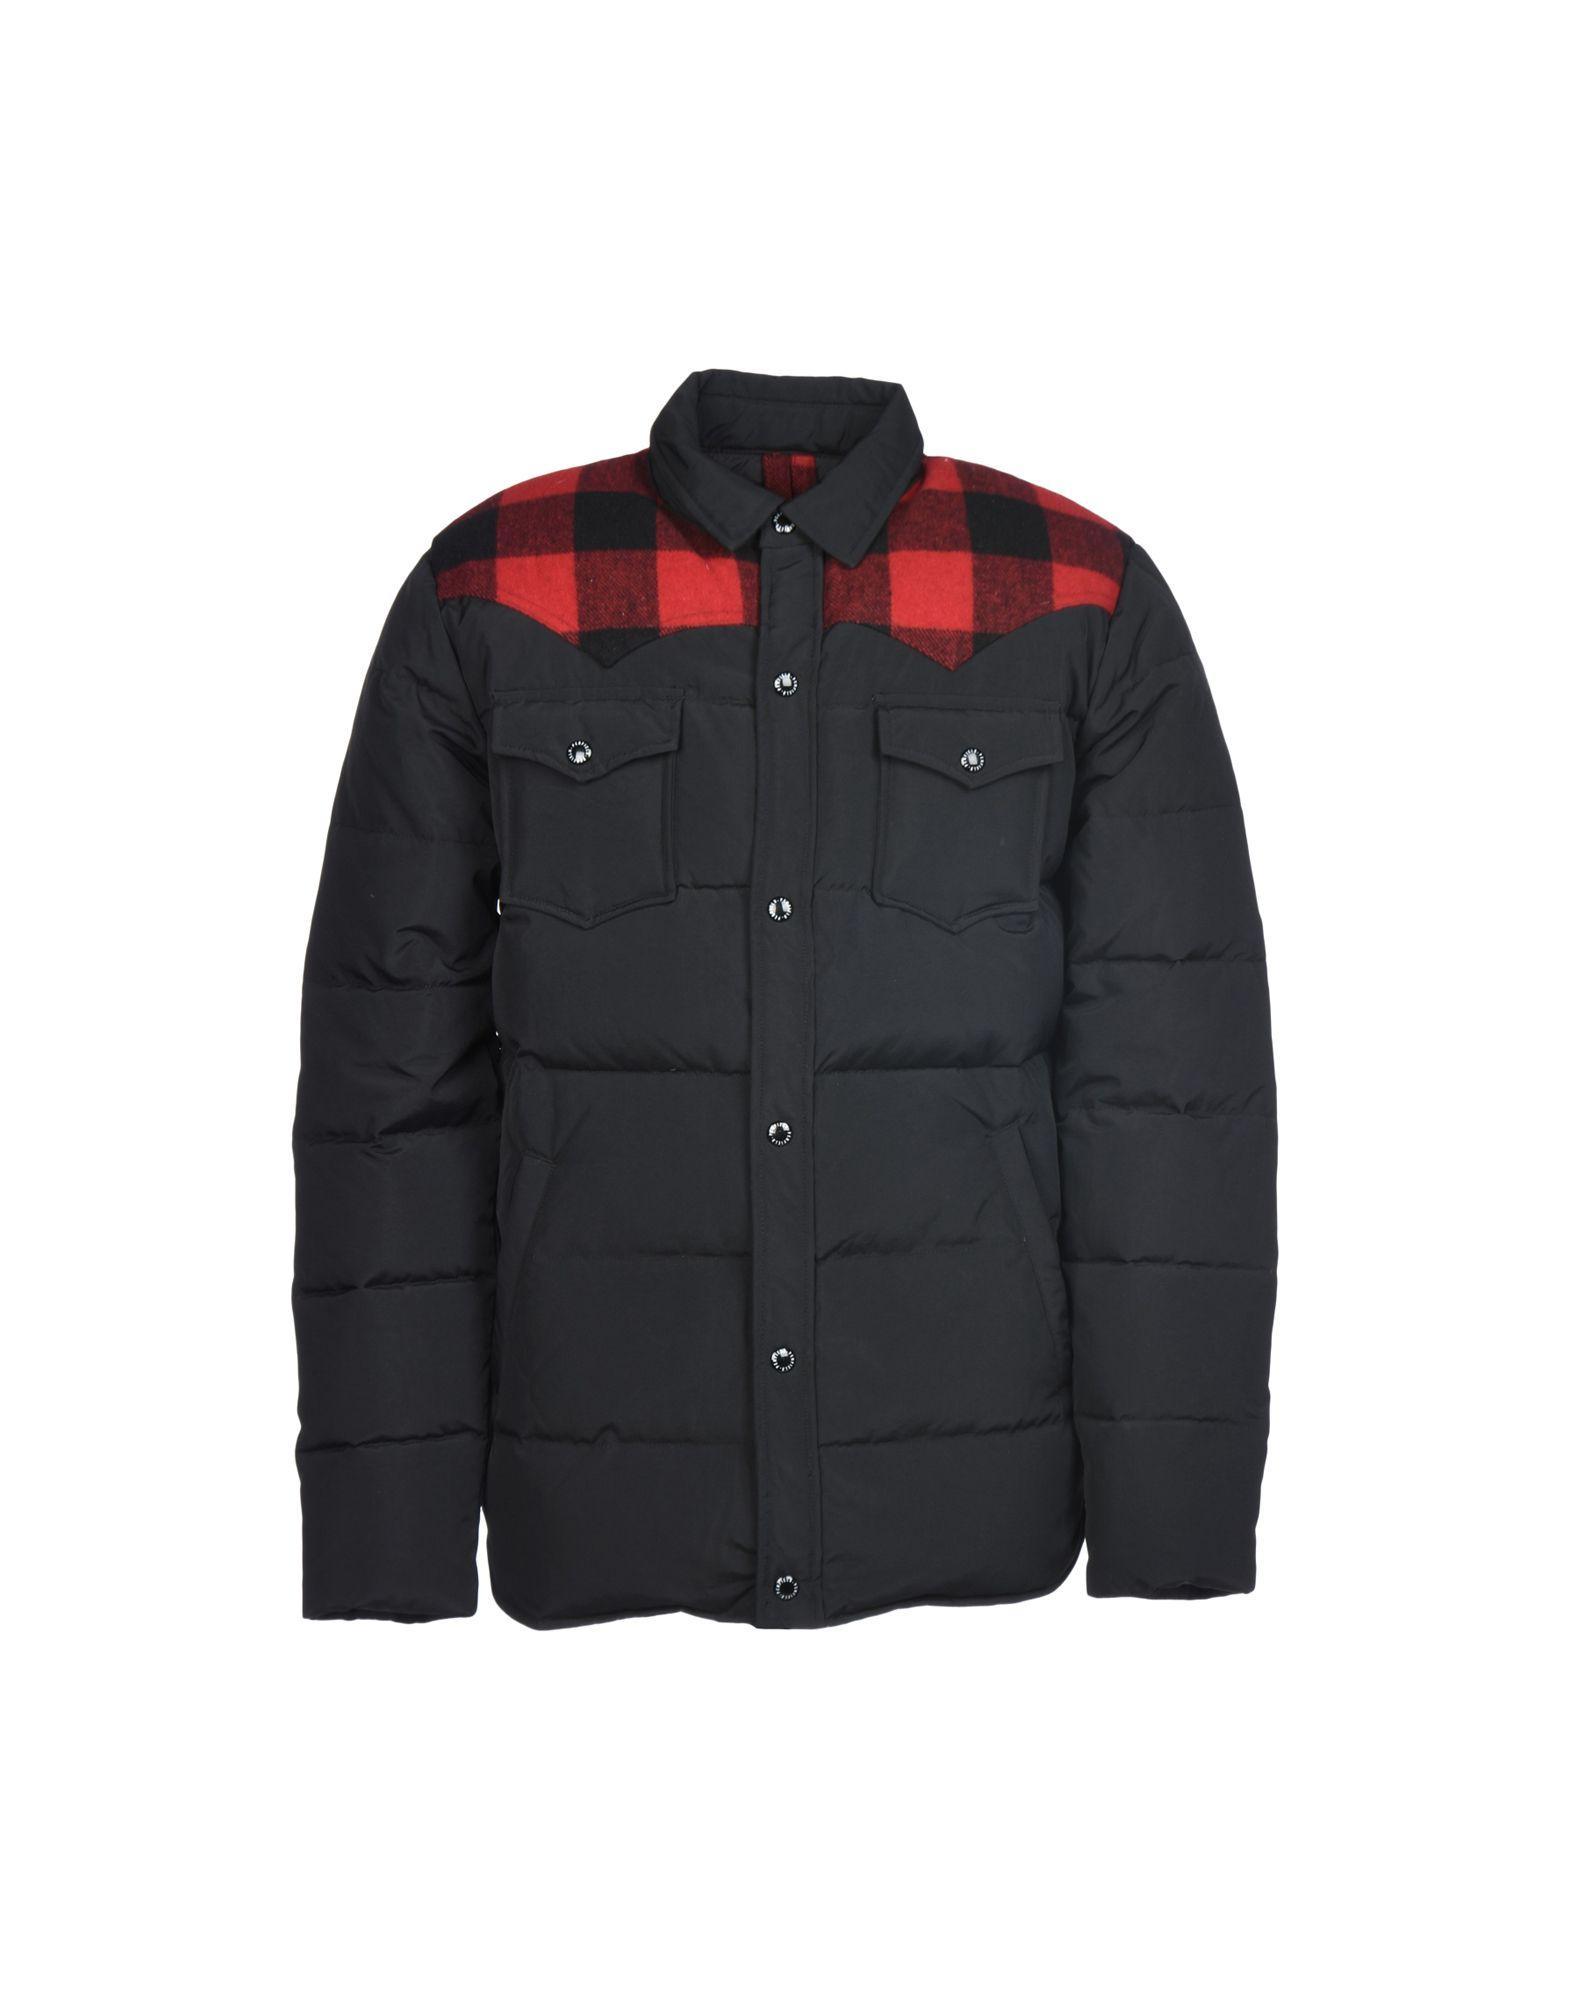 Penfield Down Jacket In Black